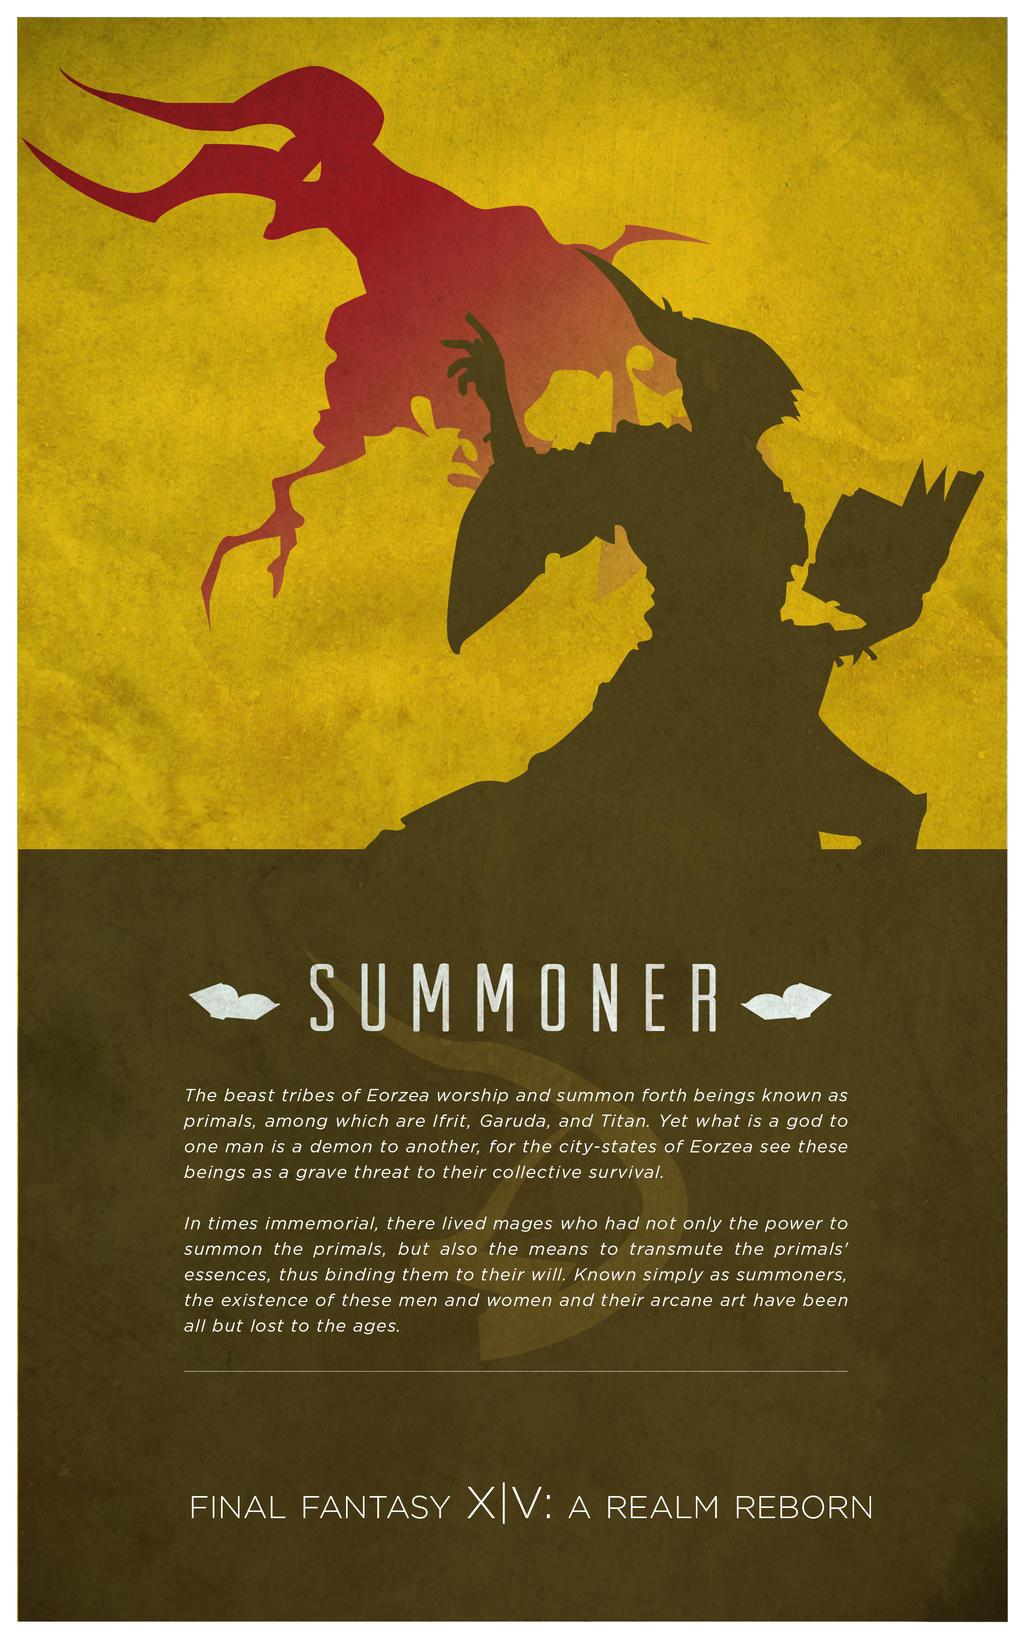 summoner final fantasy xiv by fredjully on deviantart